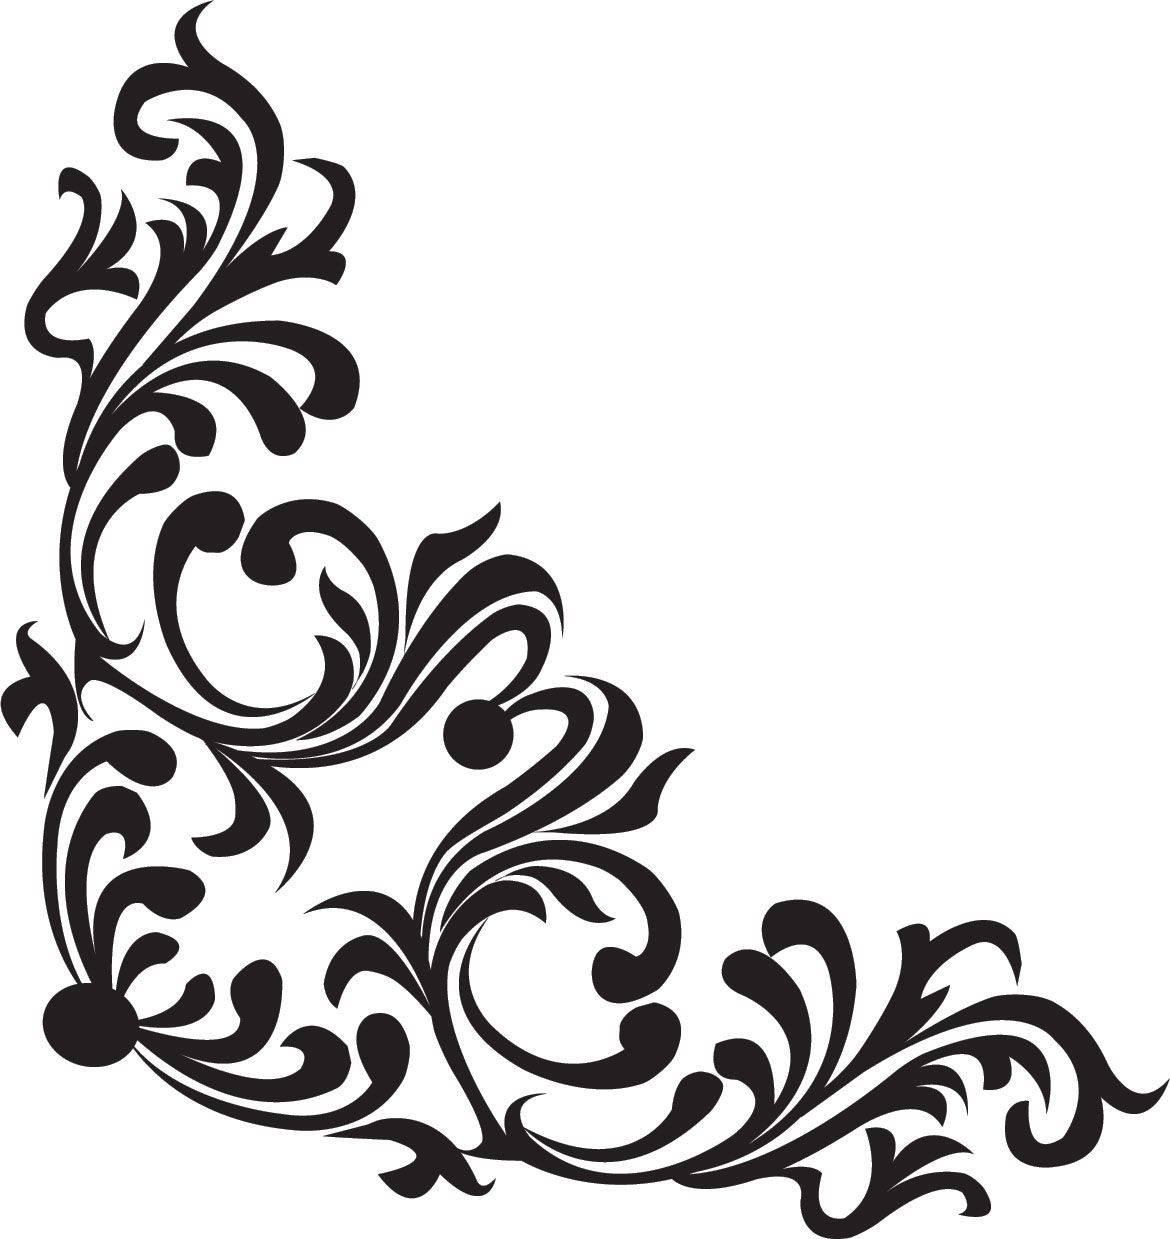 border | вензеля | pinterest | 白黒、イラスト、ステンシル